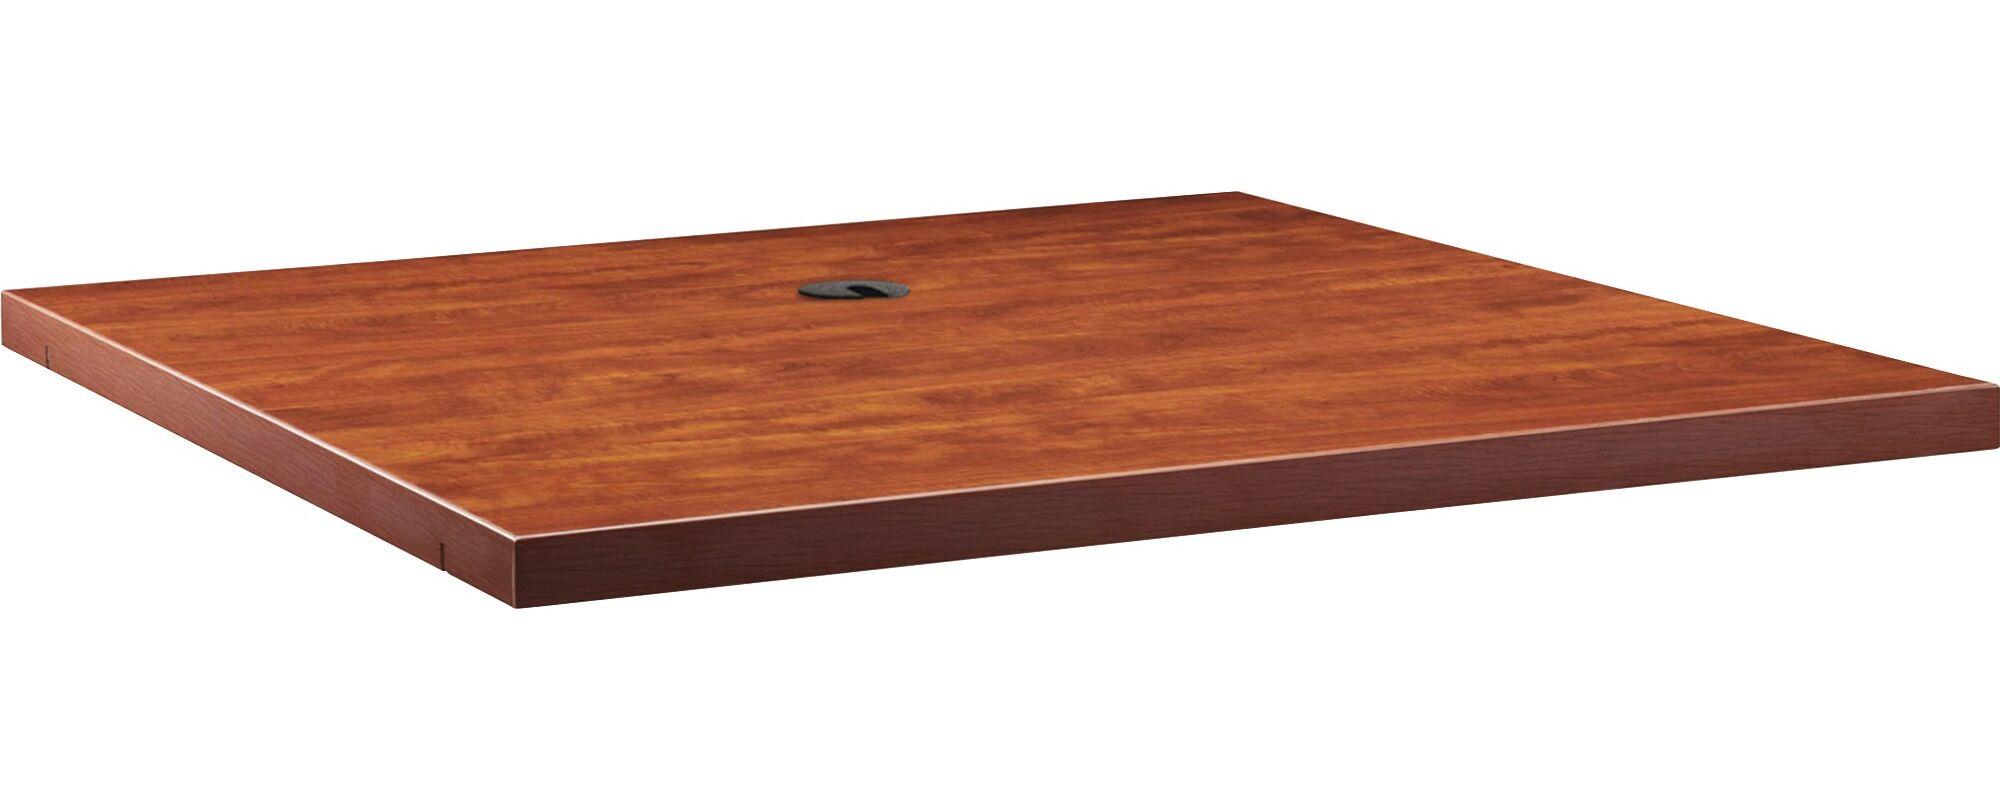 Modular Conference Table Top Finish: Mahogany